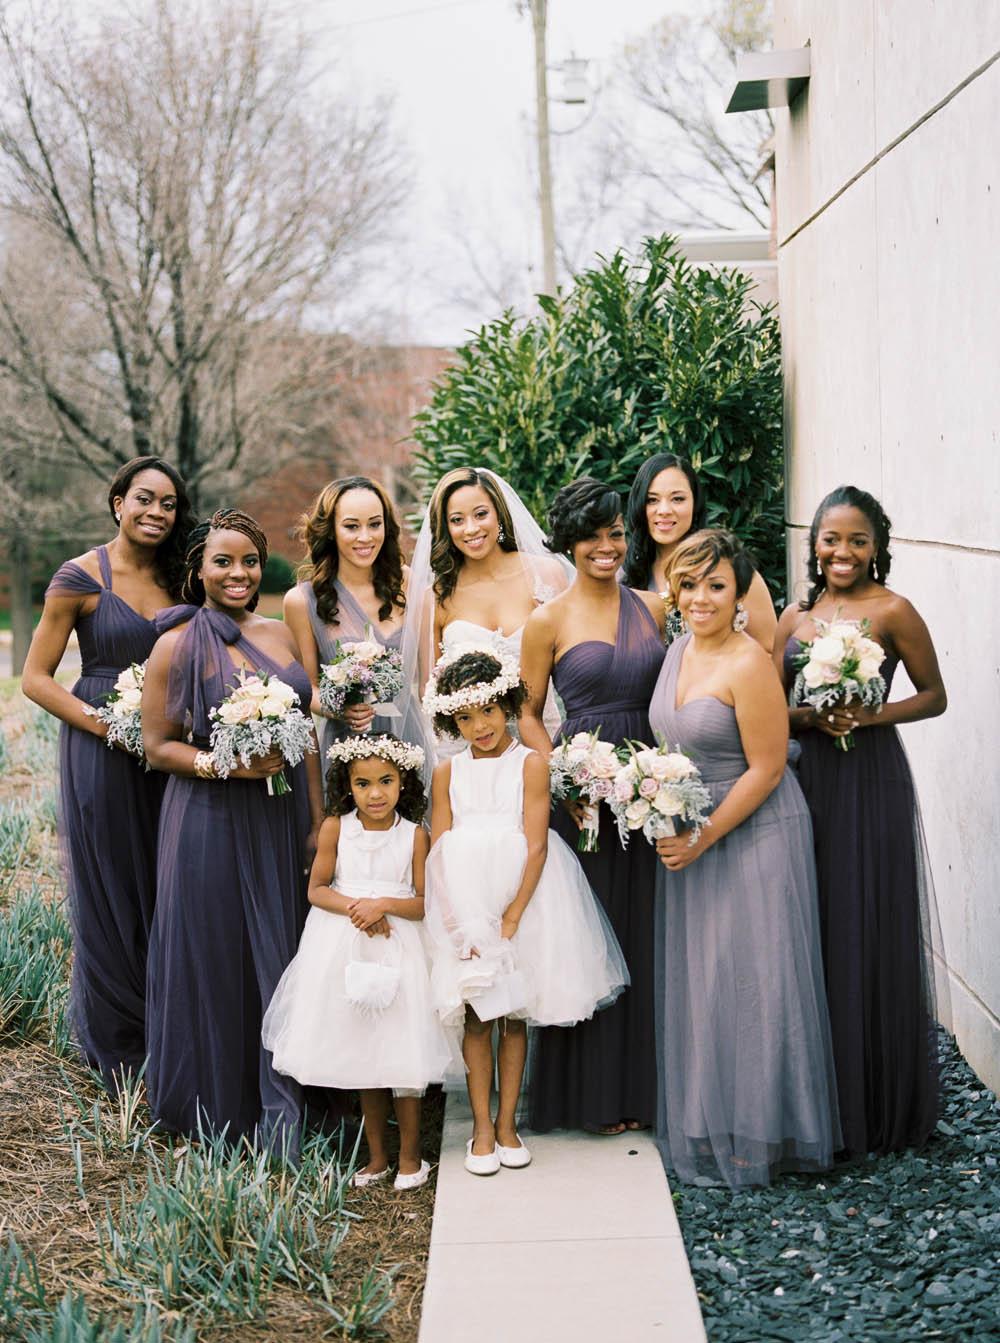 nashville ruby film documentary wedding photographer heartfelt real moments african american wedding munalachi bride ©2016abigailbobophotography-30.jpg